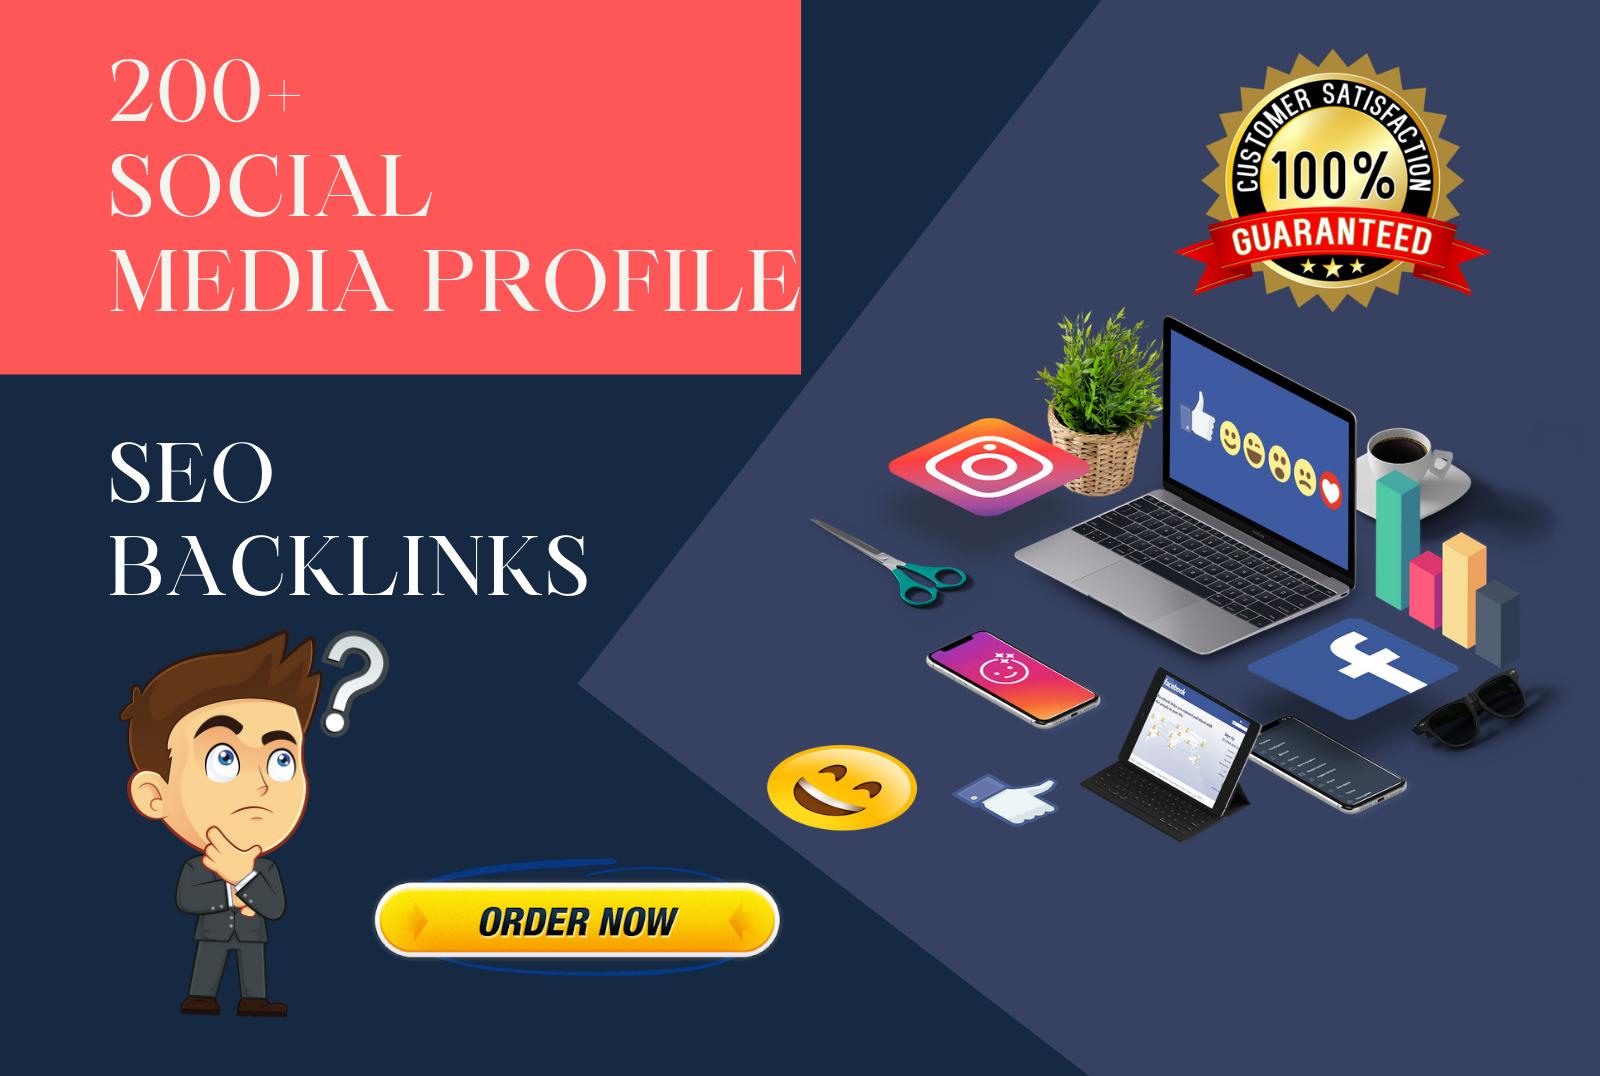 I will create 200 social media profile SEO backlinks